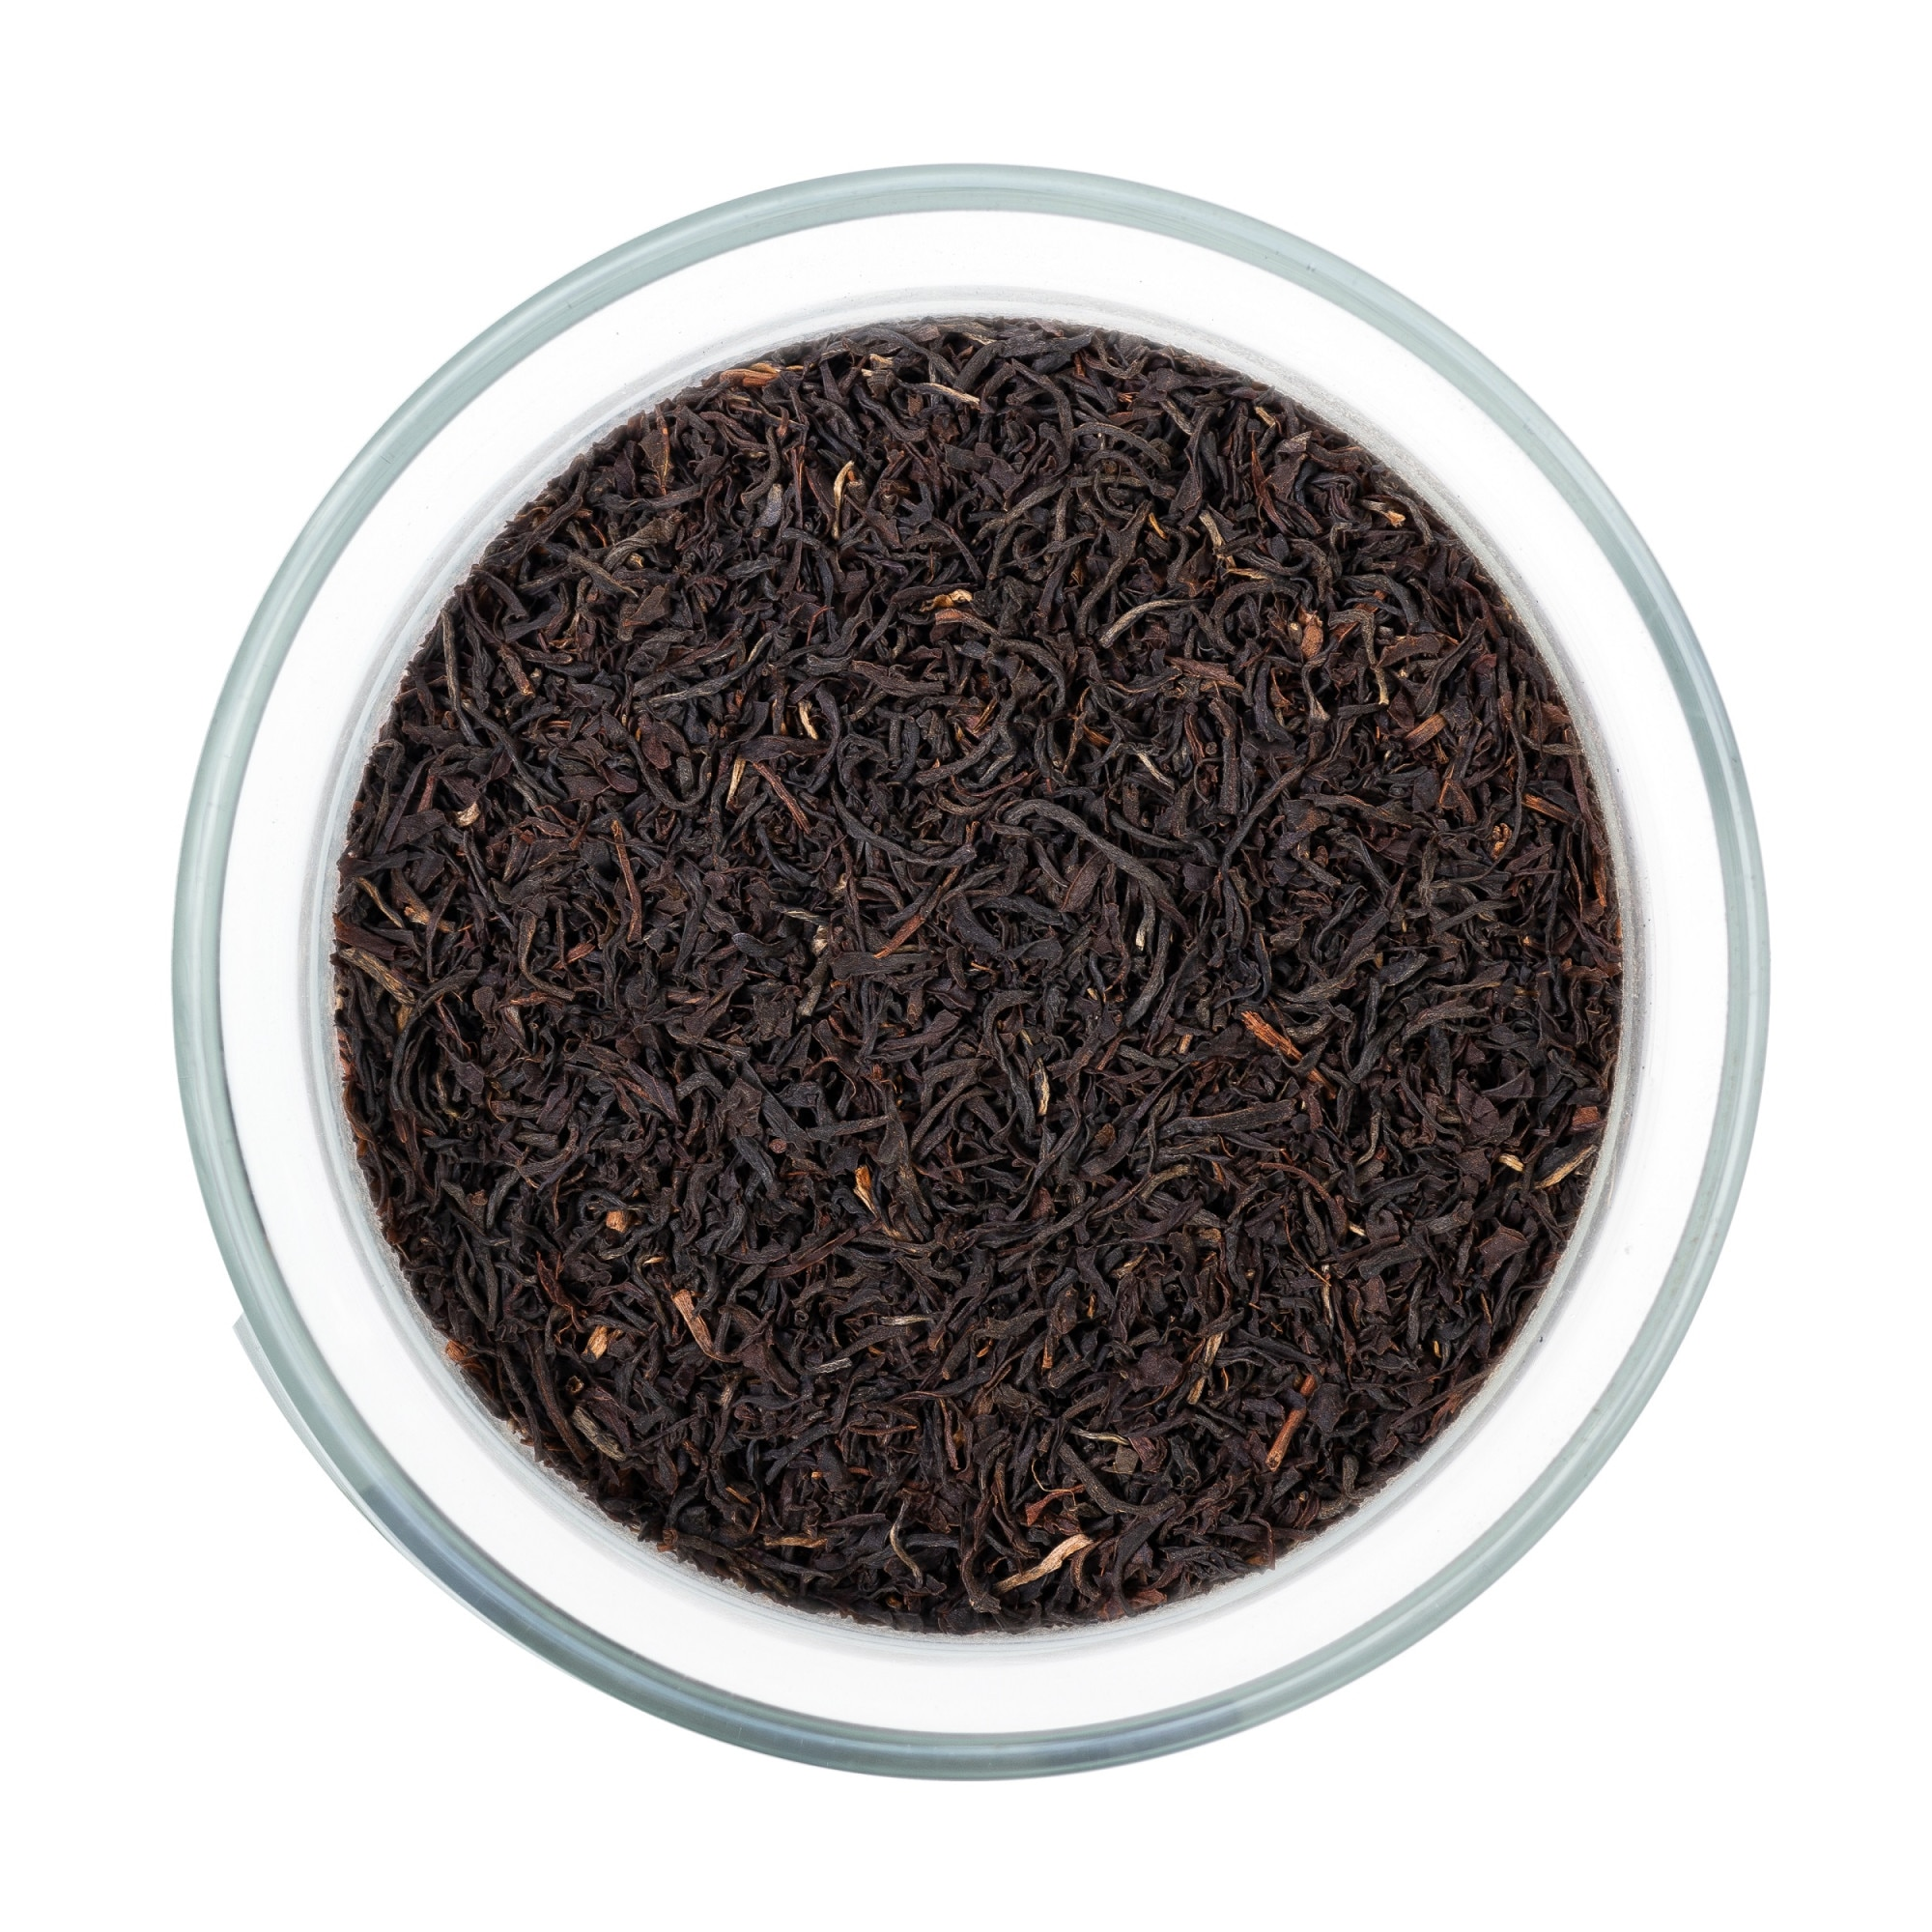 pungi de ceai în kenya)